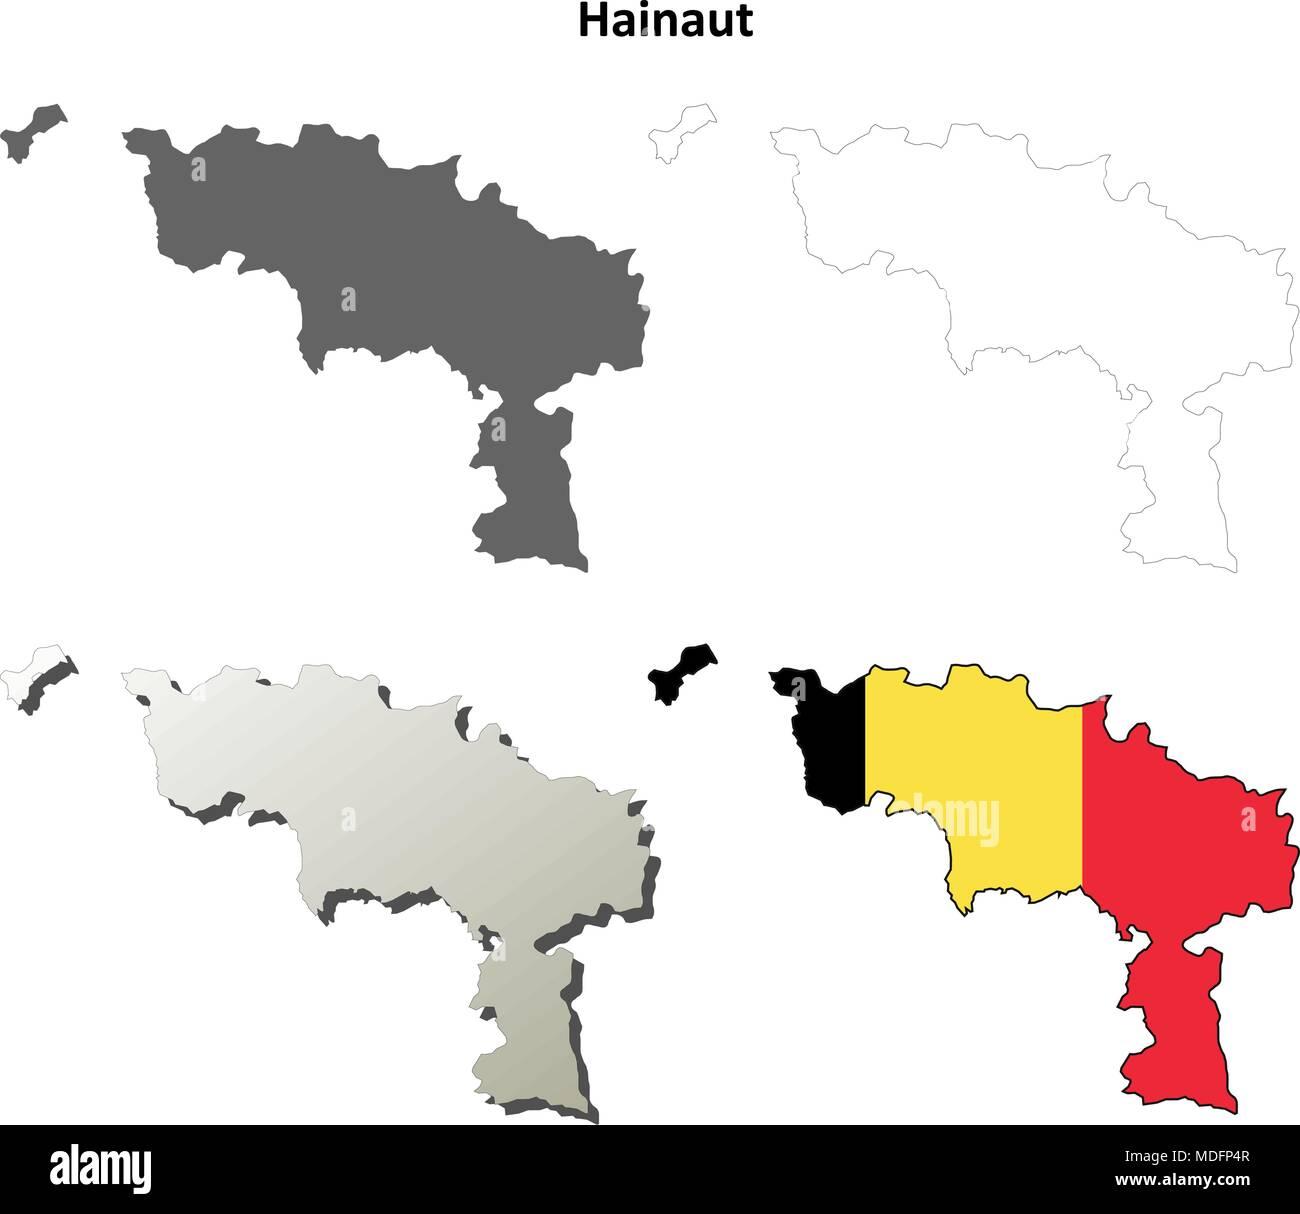 Belgien Karte Umriss.Hainaut Umriss Karte Set Belgische Version Vektor Abbildung Bild